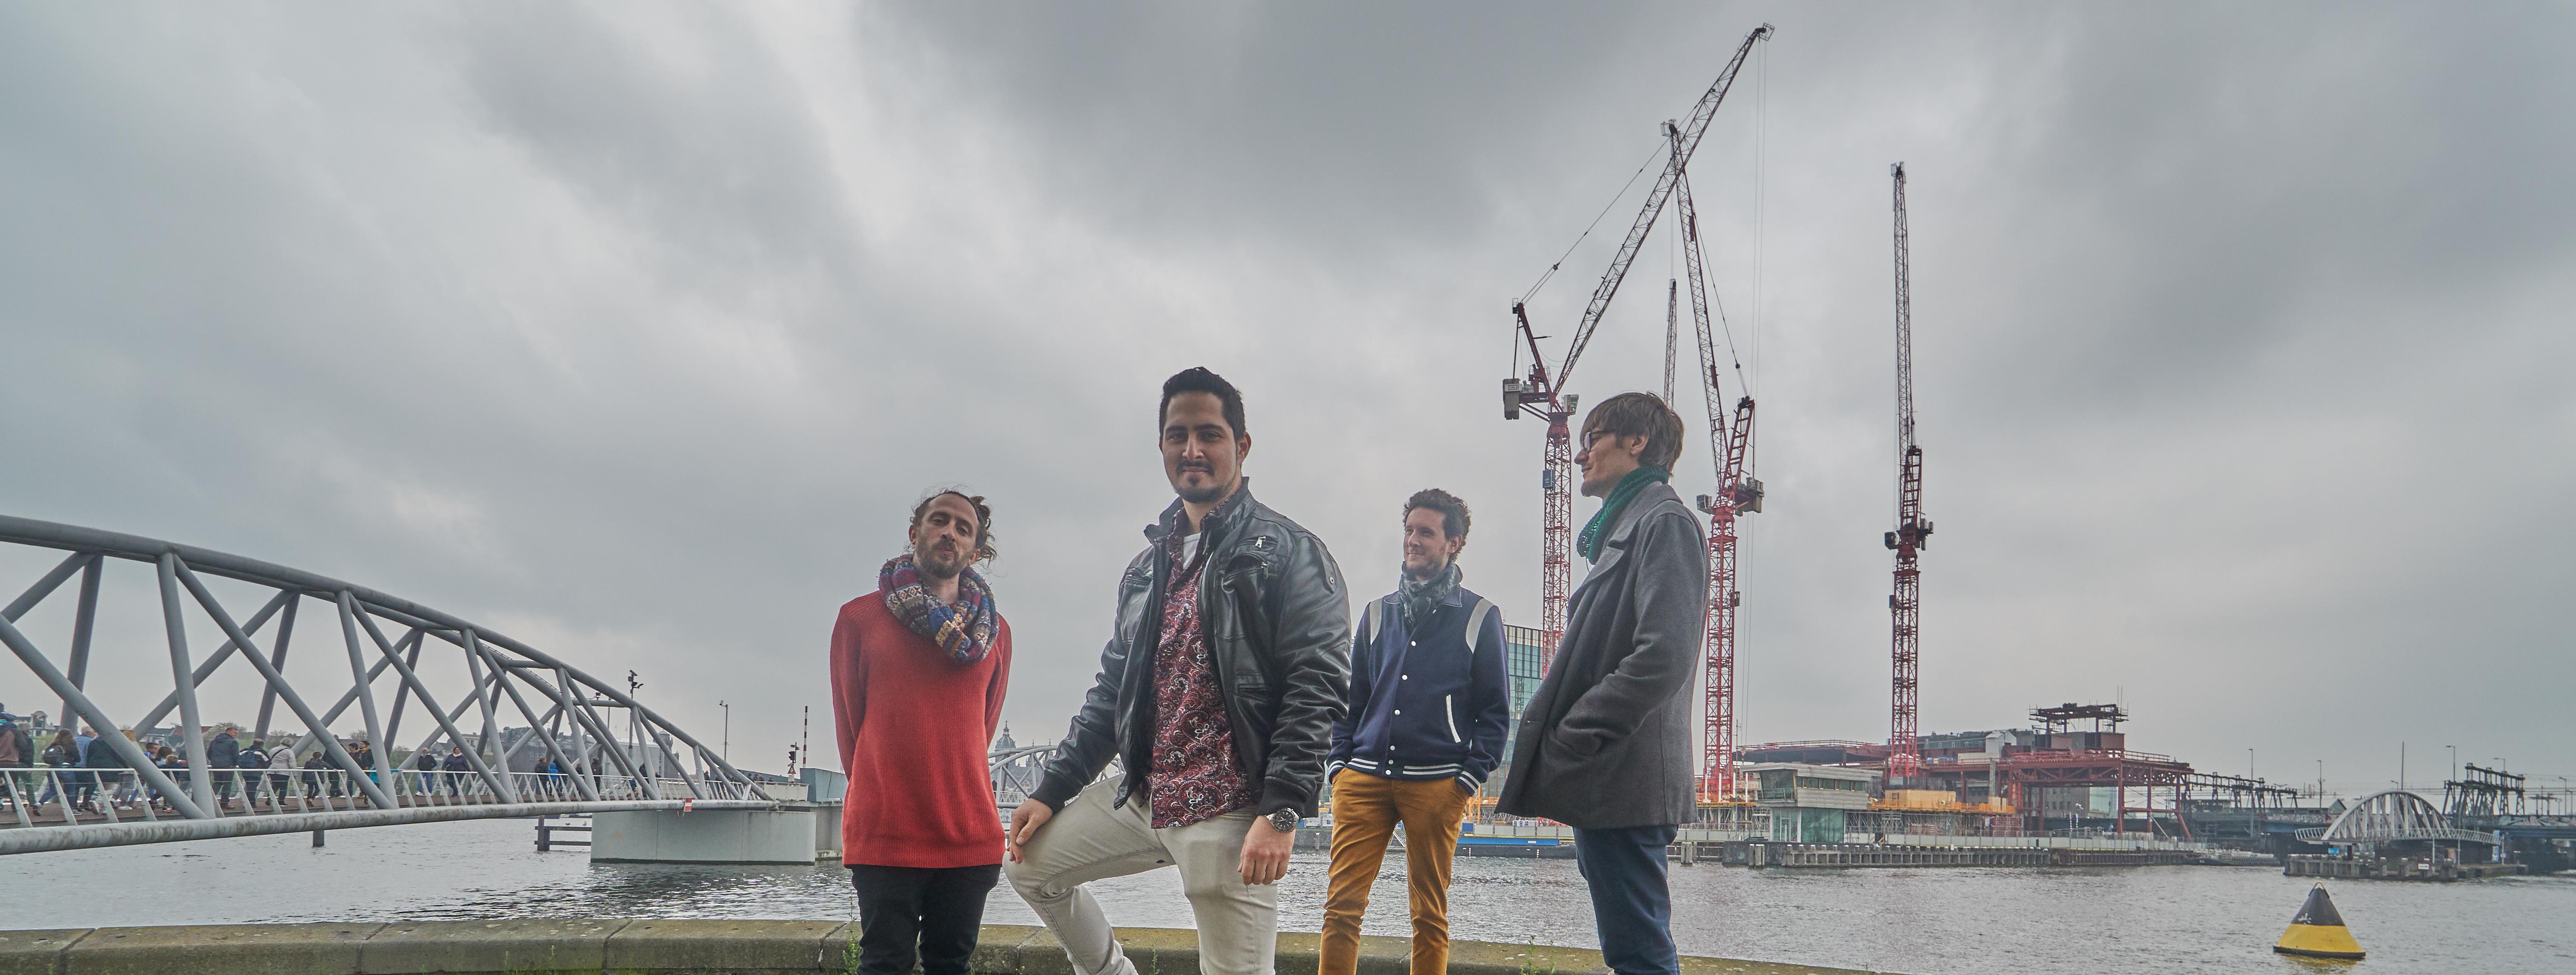 Aviv Noam Quartet in Amsterdam